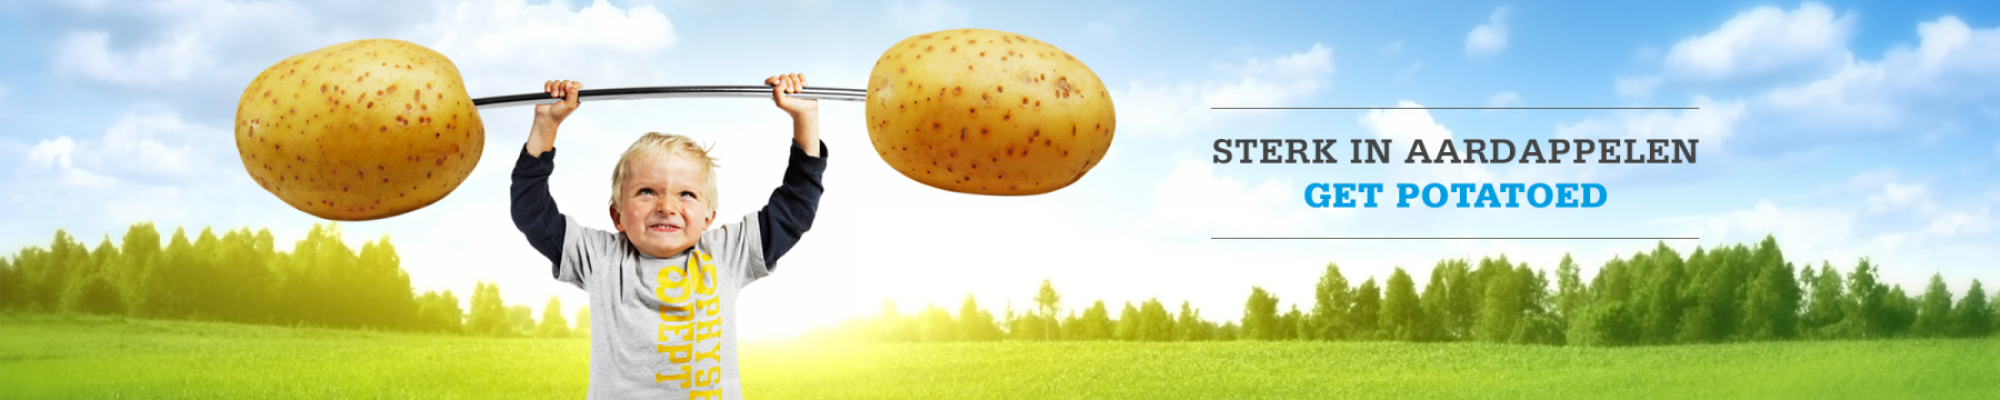 Warnez Get Potatoed Contact